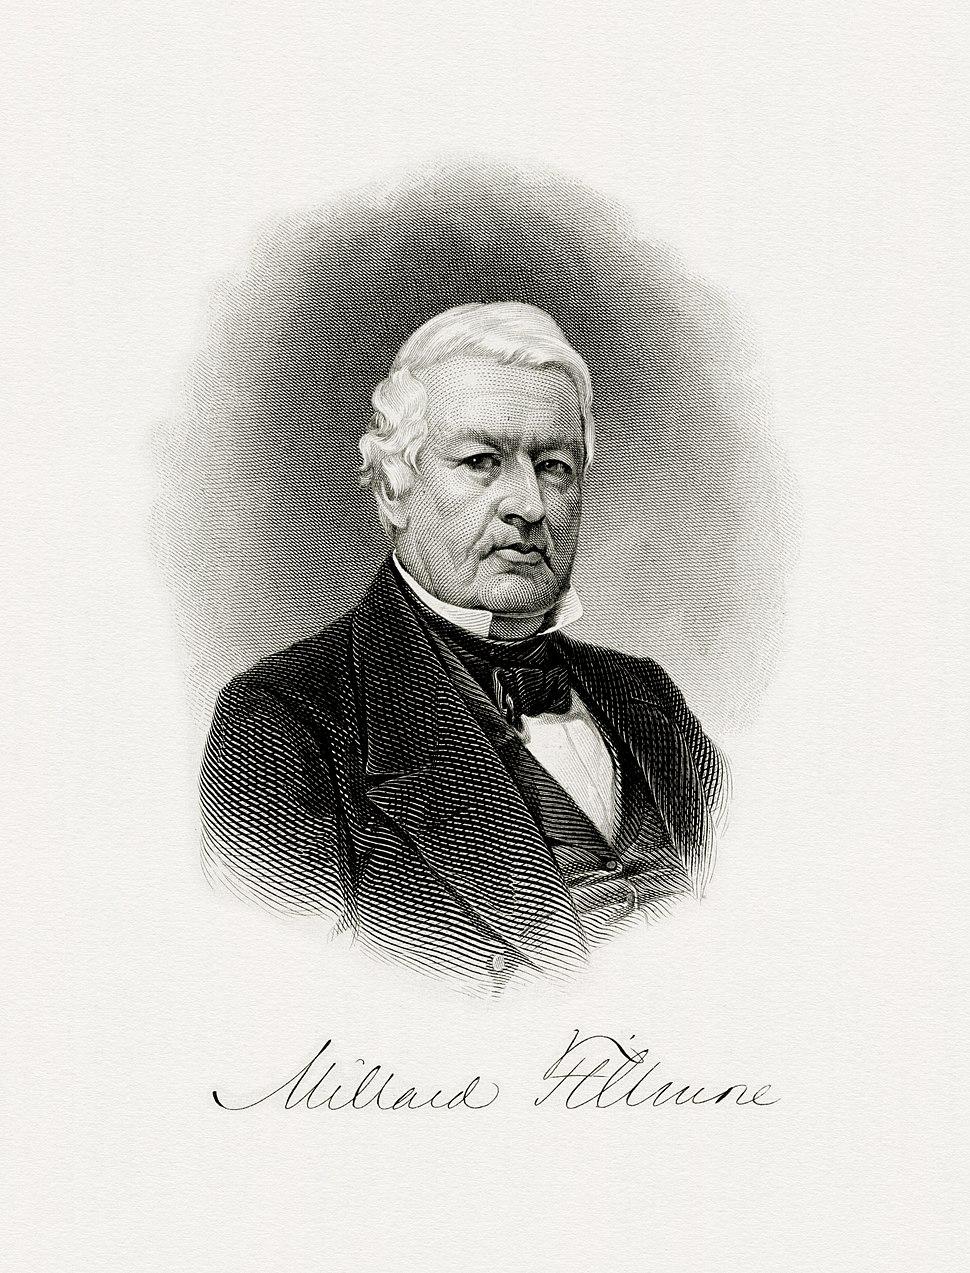 FILLMORE, Millard-President (BEP engraved portrait)